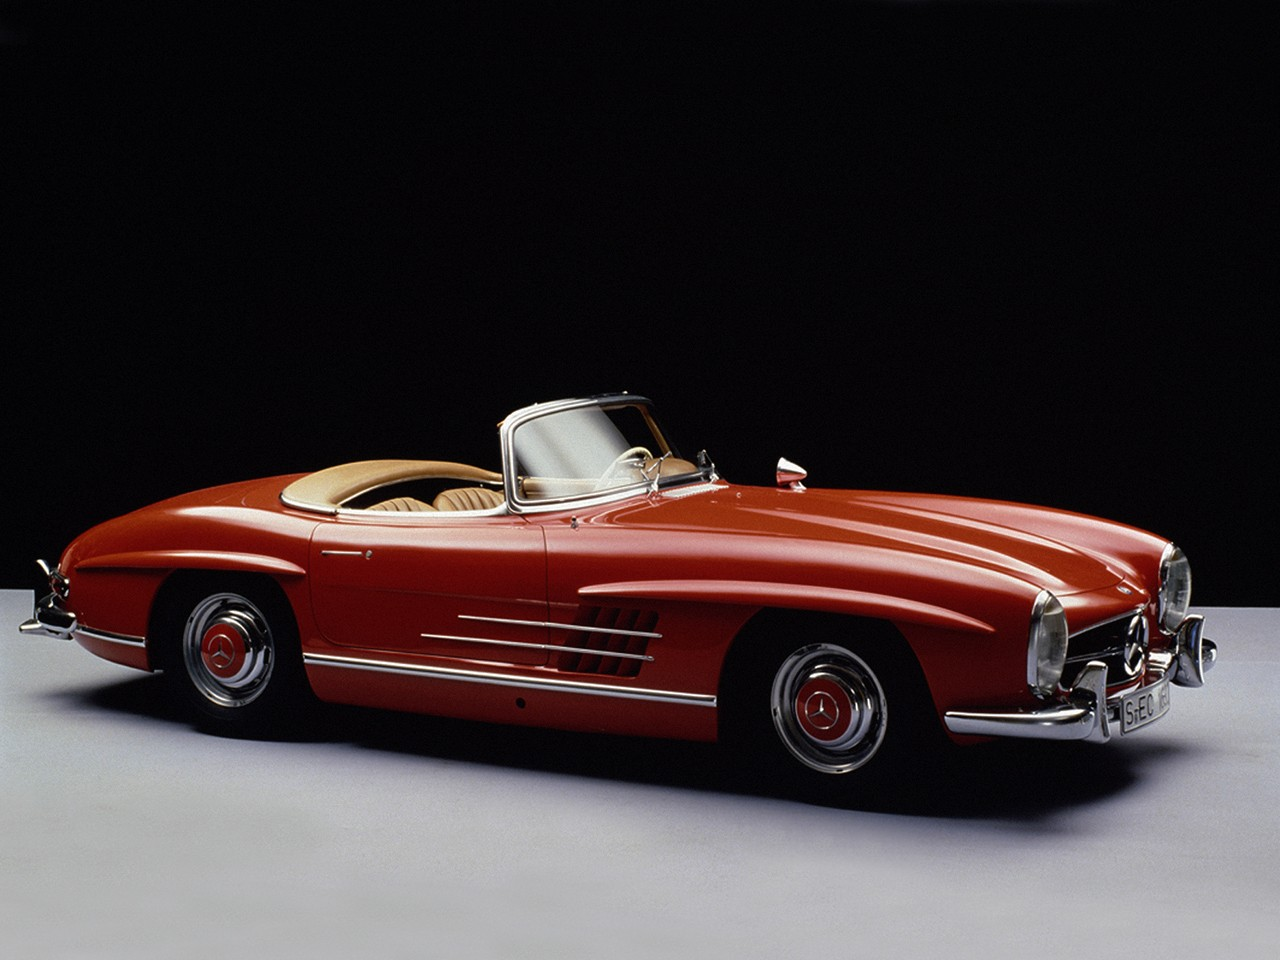 Mercedes Benz 300 Sl Roadster W198 Specs 1957 1958